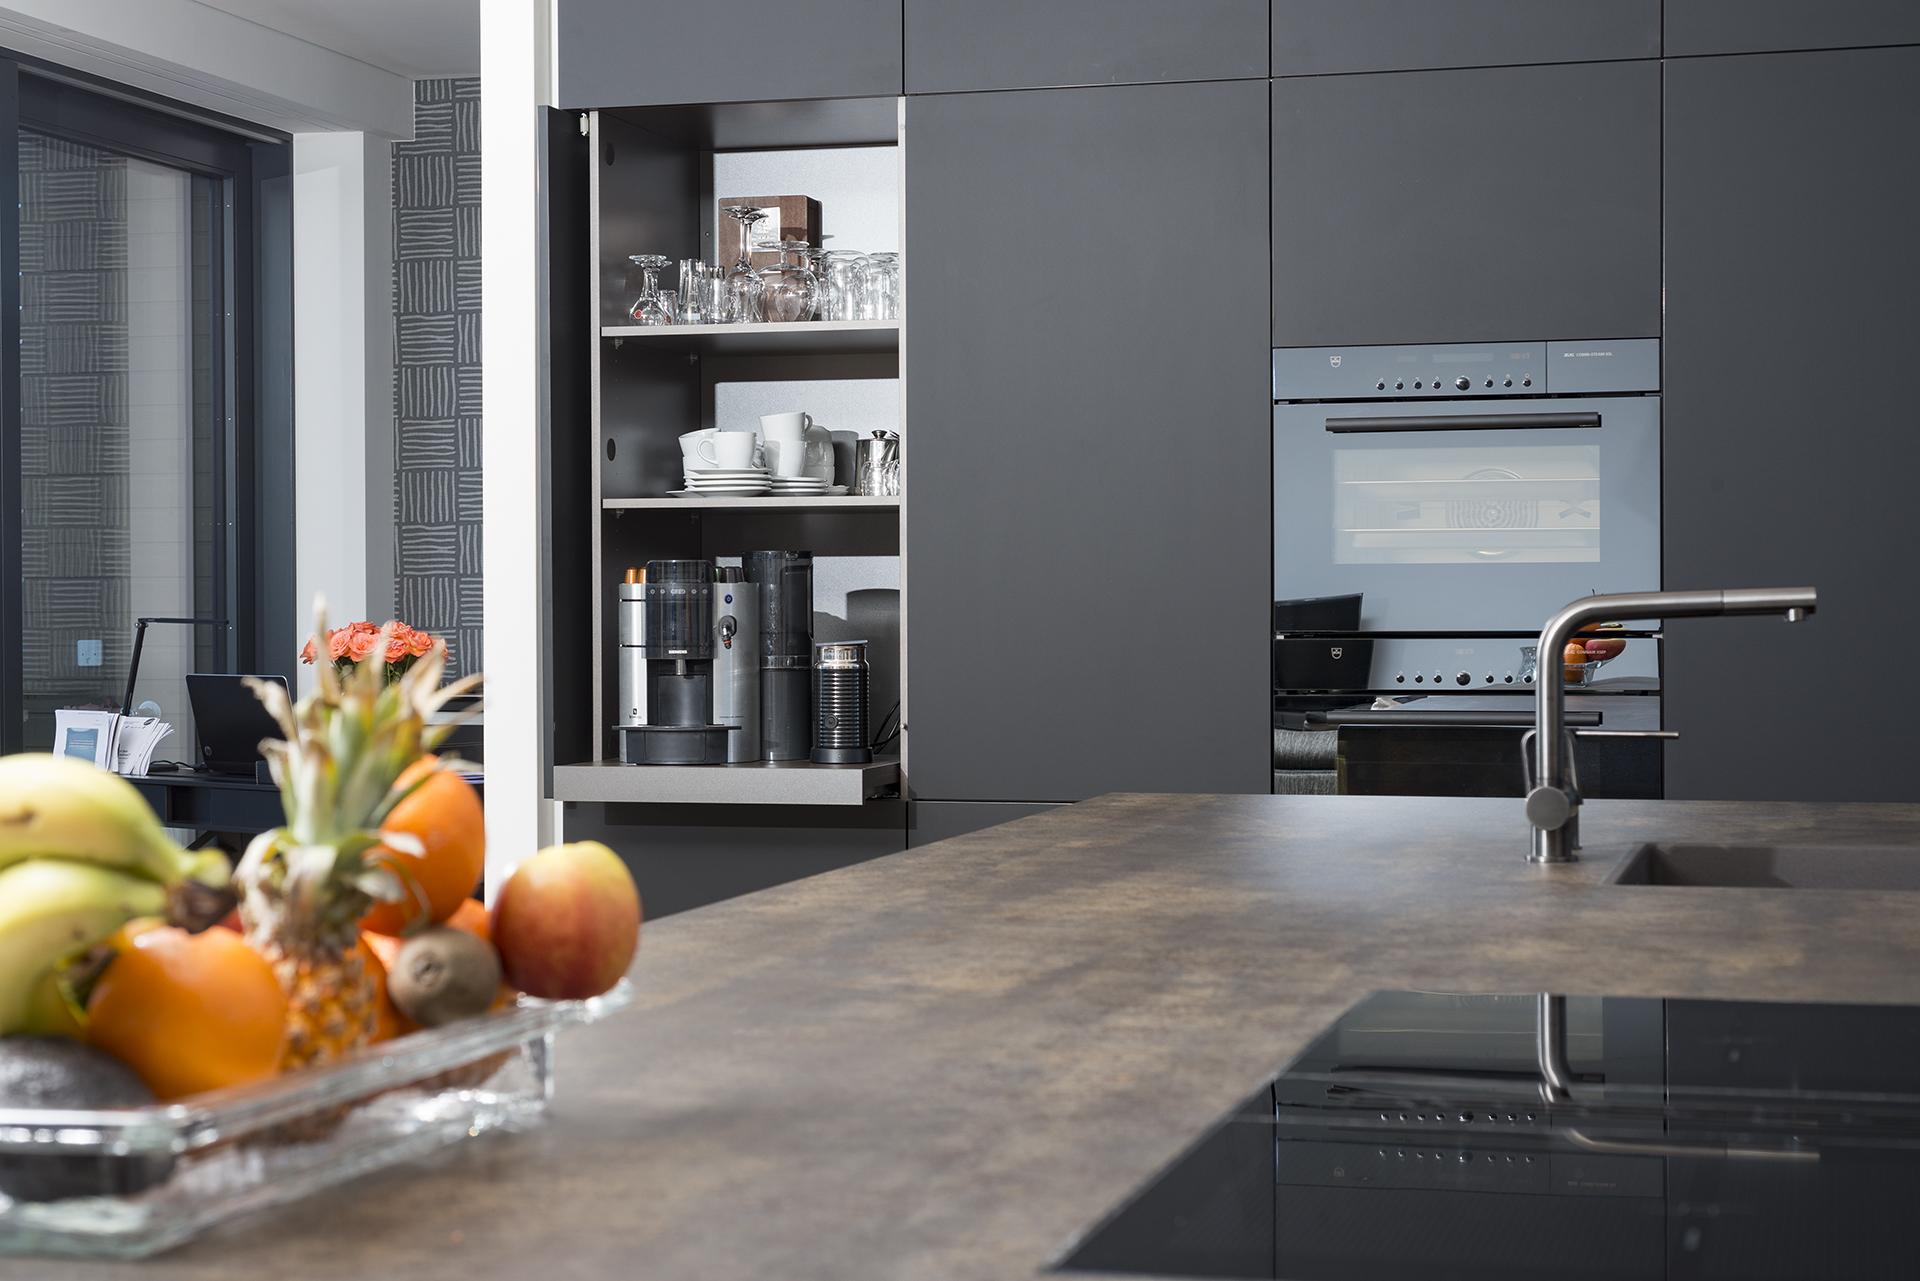 Baumann Küche